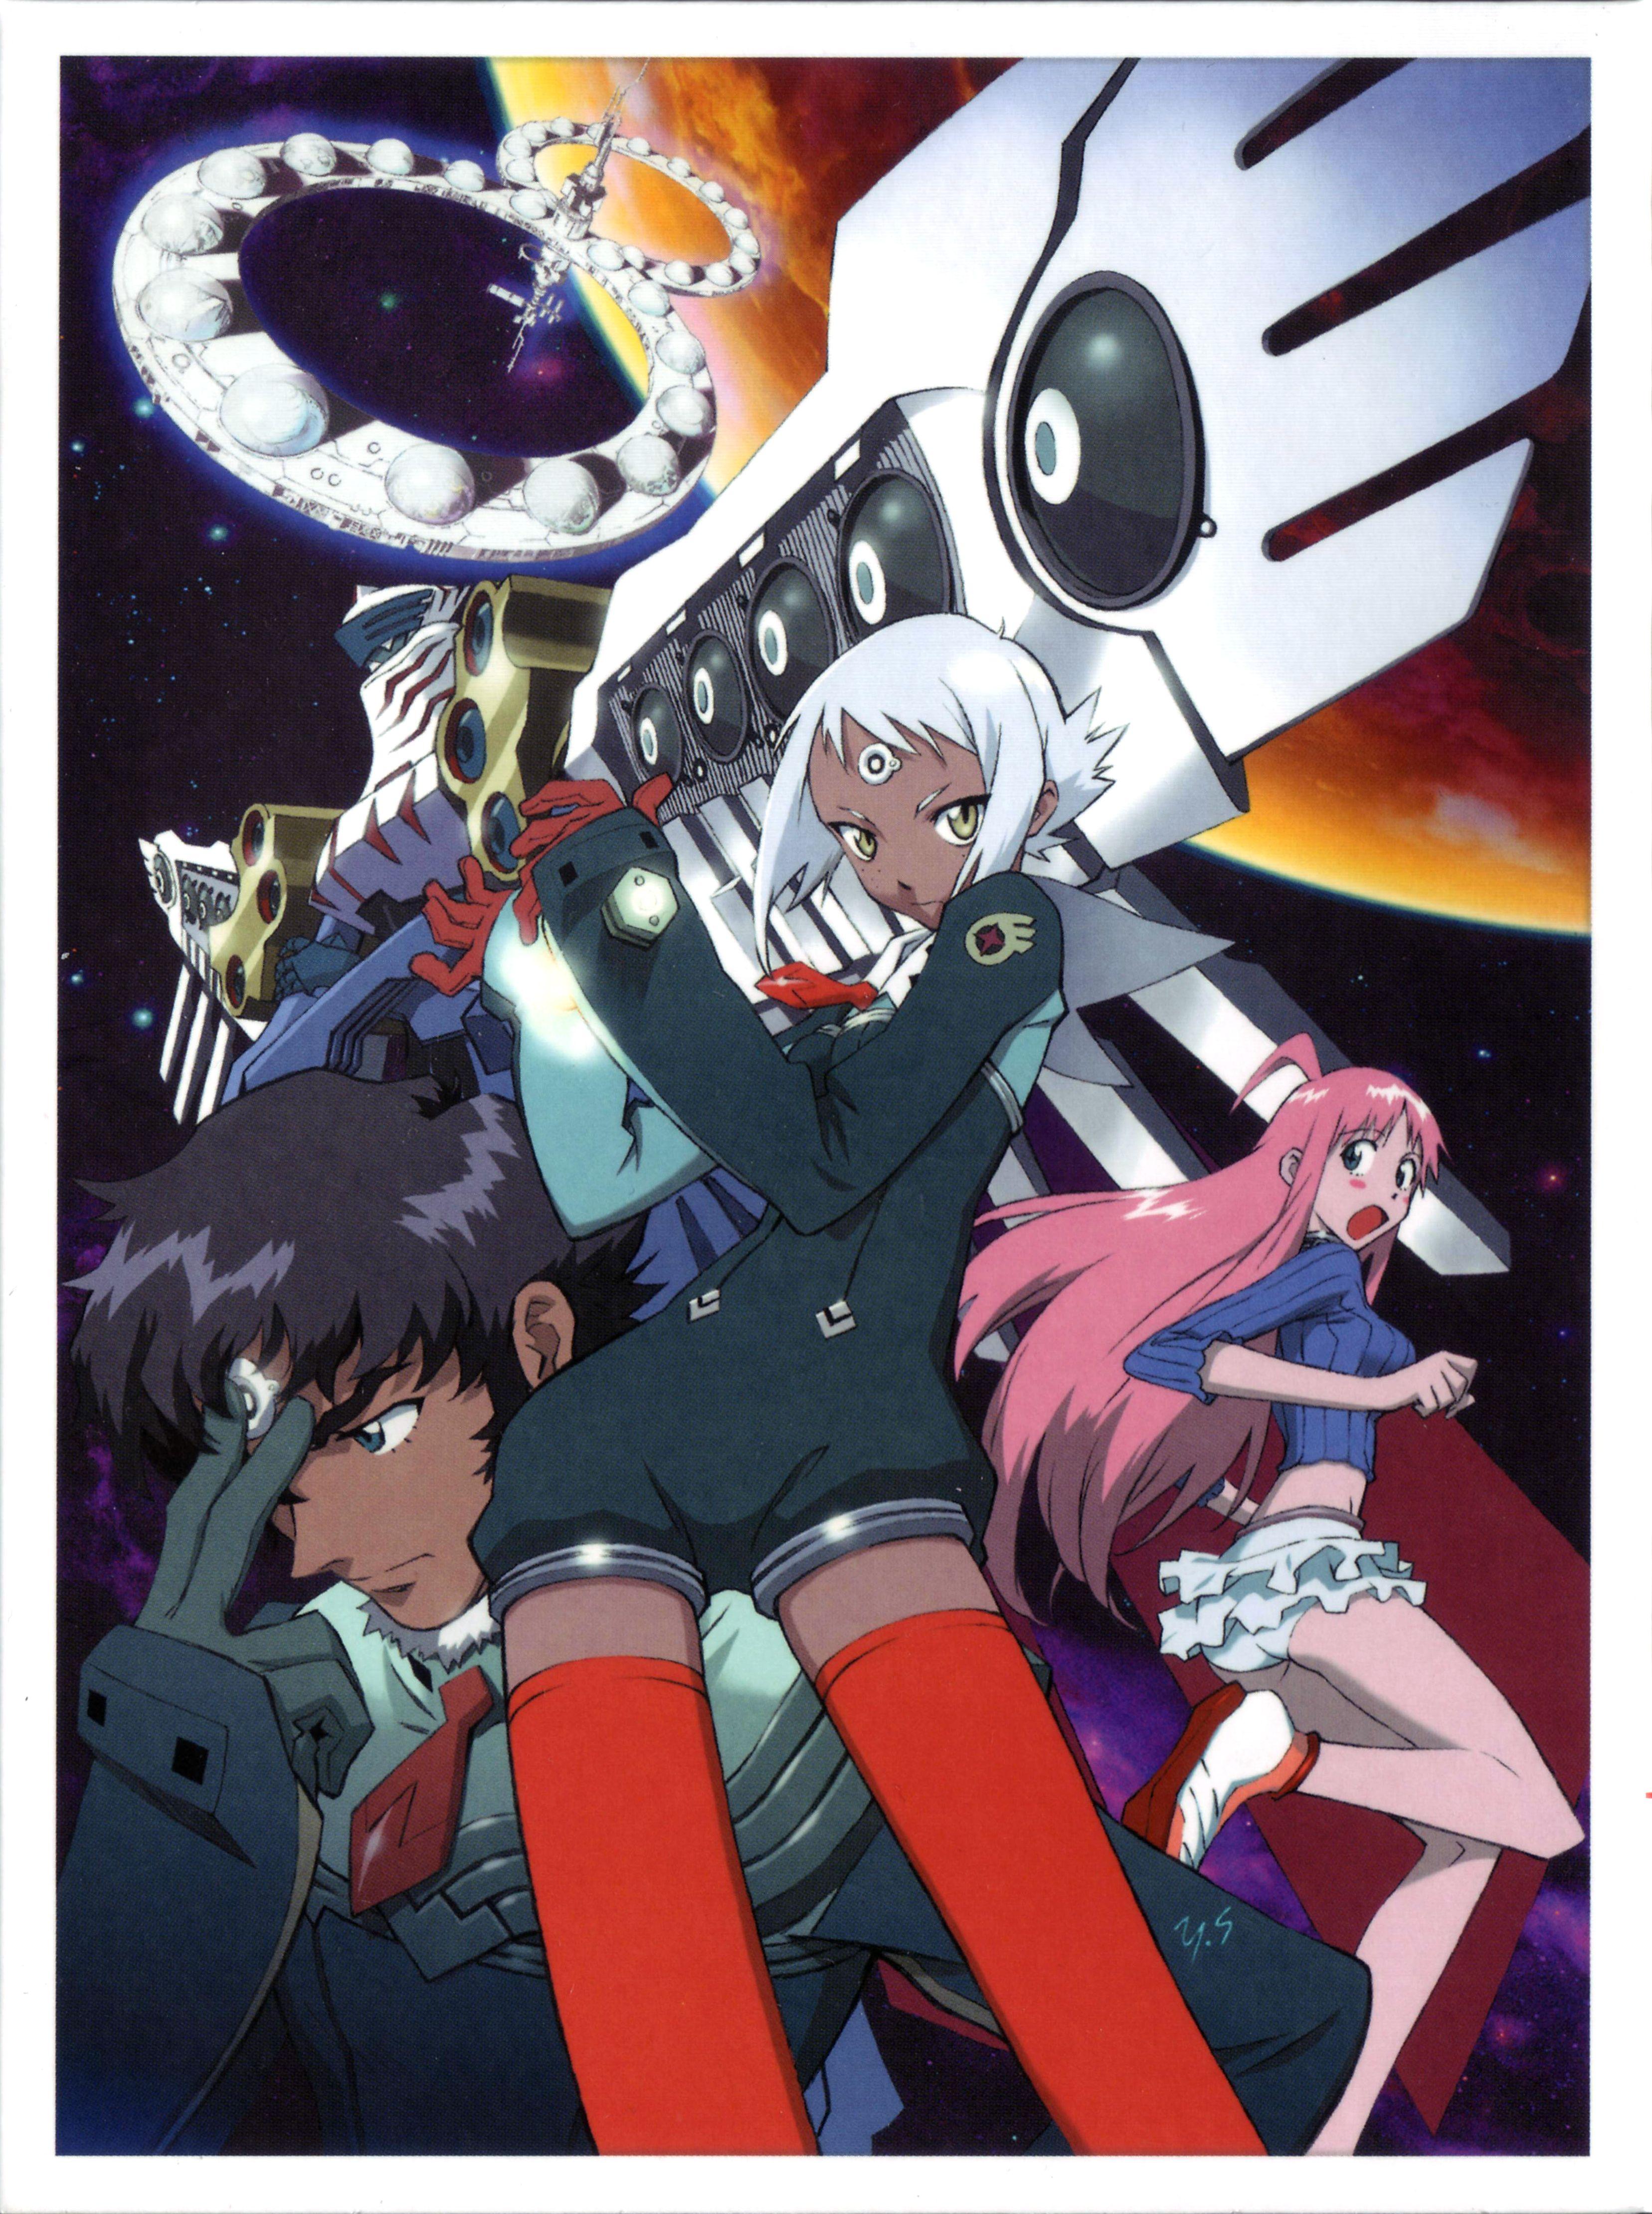 Download Top O Nerae 2 Gunbuster Diebuster Digipak2 3313x4439 Minitokyo 90 Anime Anime Anime Art